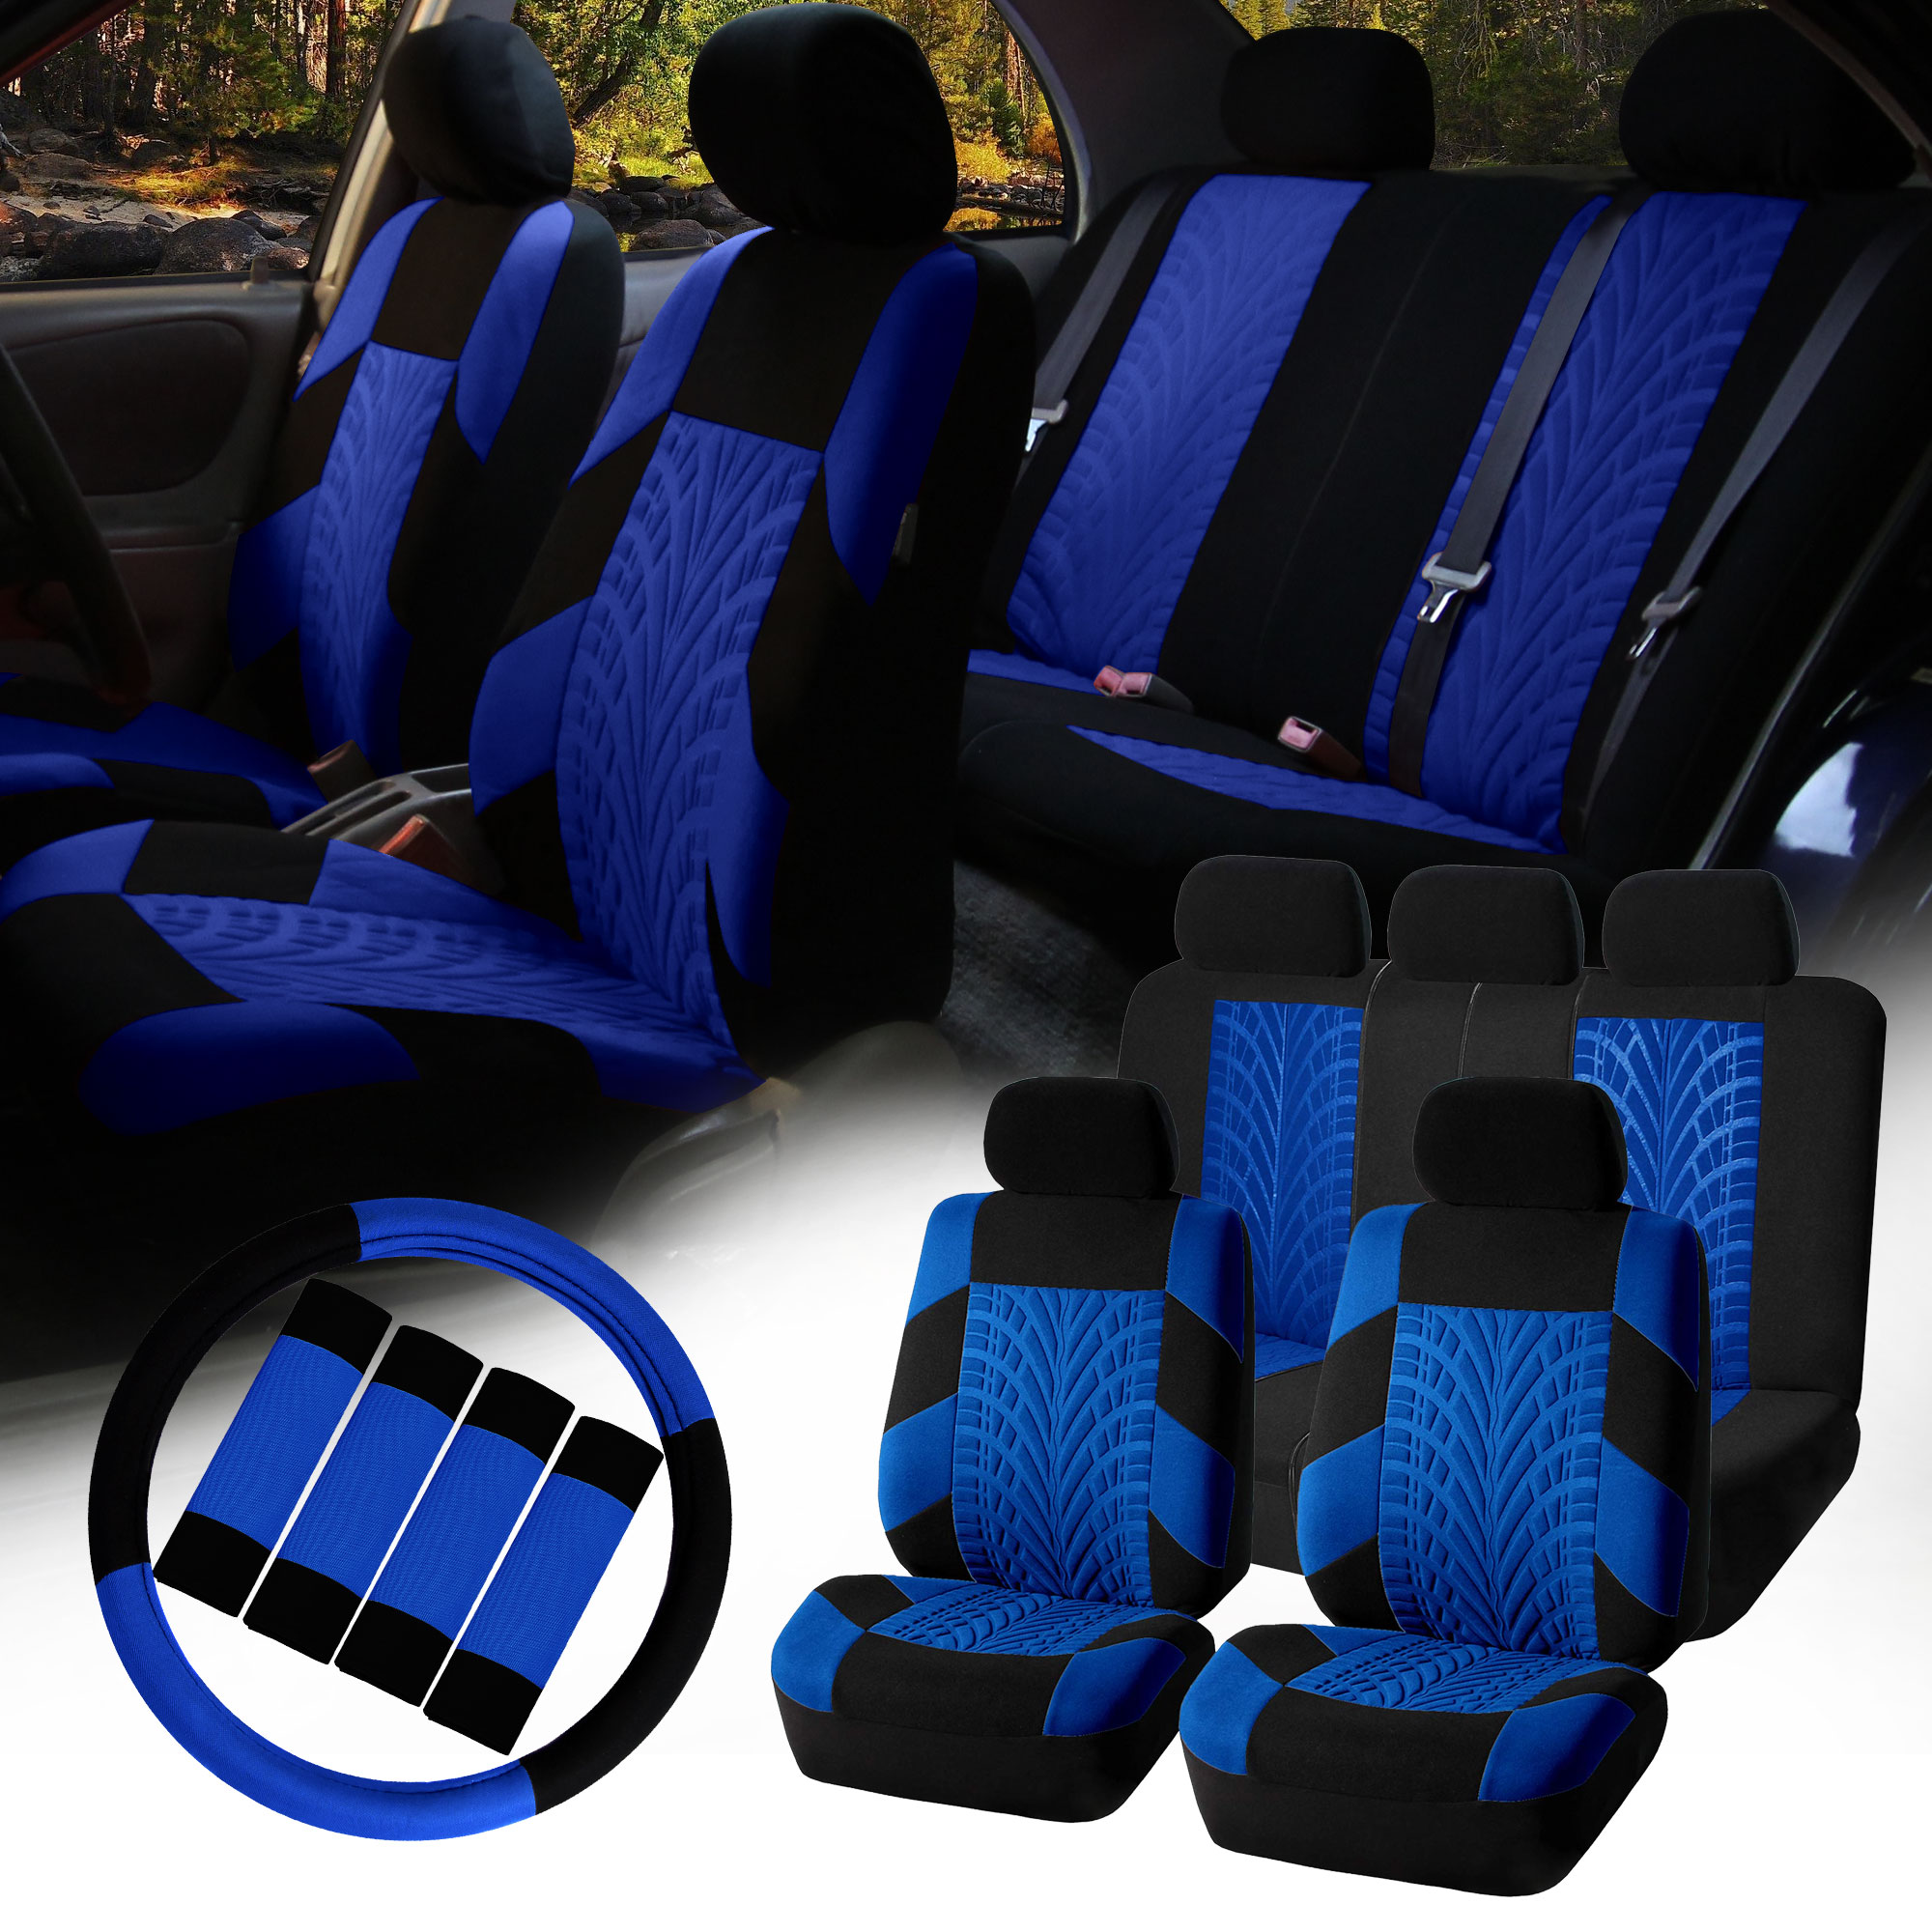 FH Group Car Seat Covers Travel Master for Sedan, SUV, Van, Full Set w/ Steering Cover & Belt Pads, Blue Black